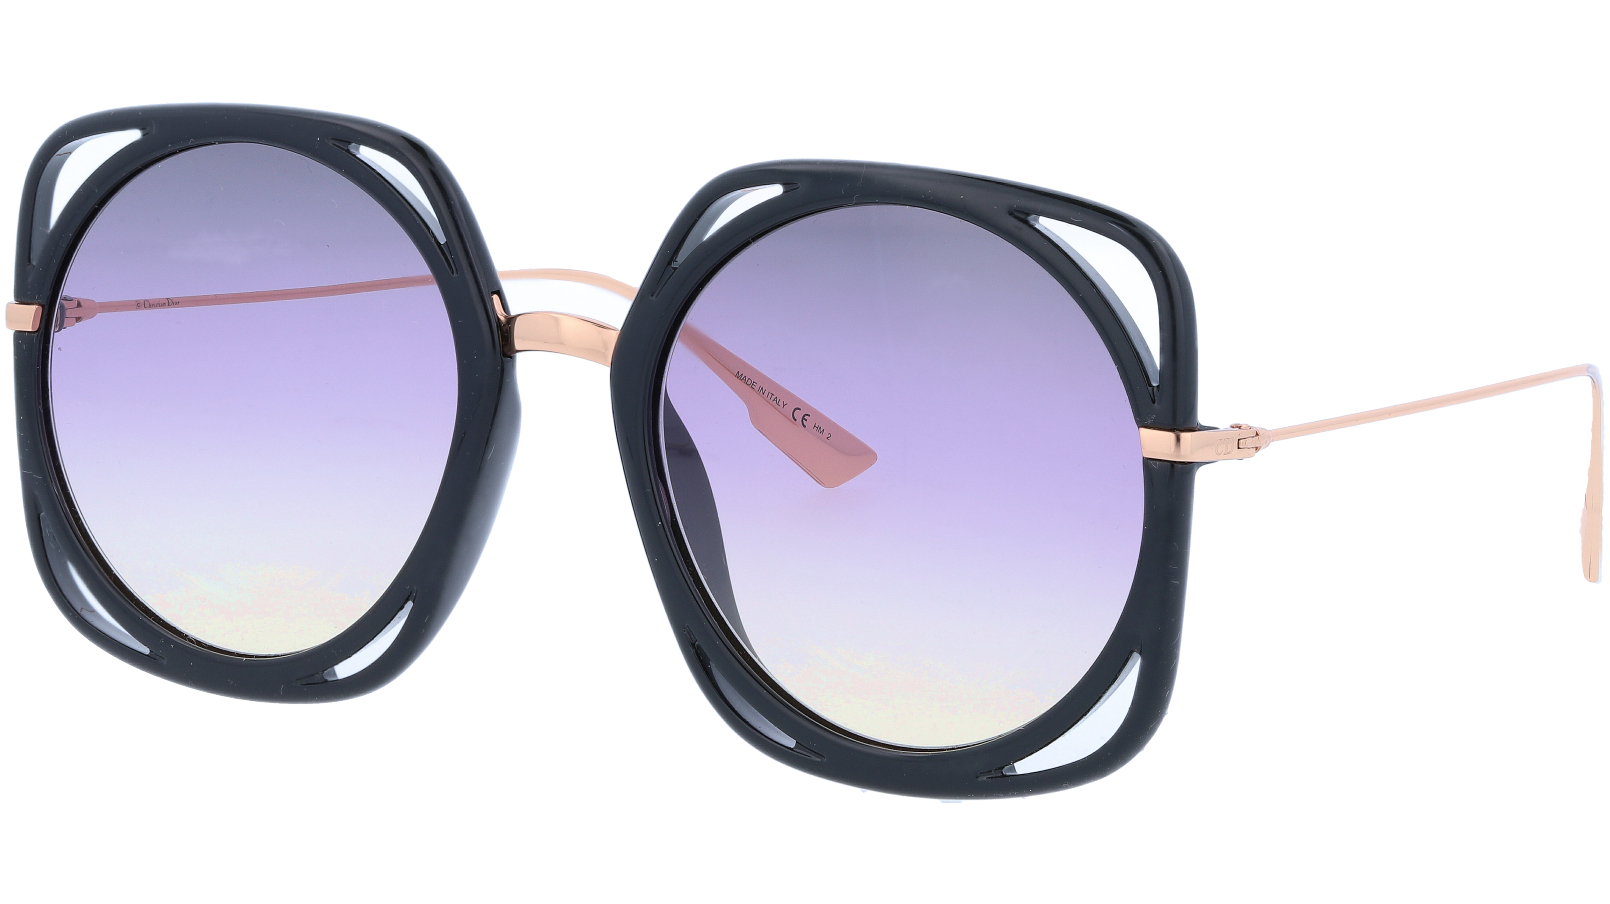 Dior DIRECTION 2M21I 56 Black Sunglasses